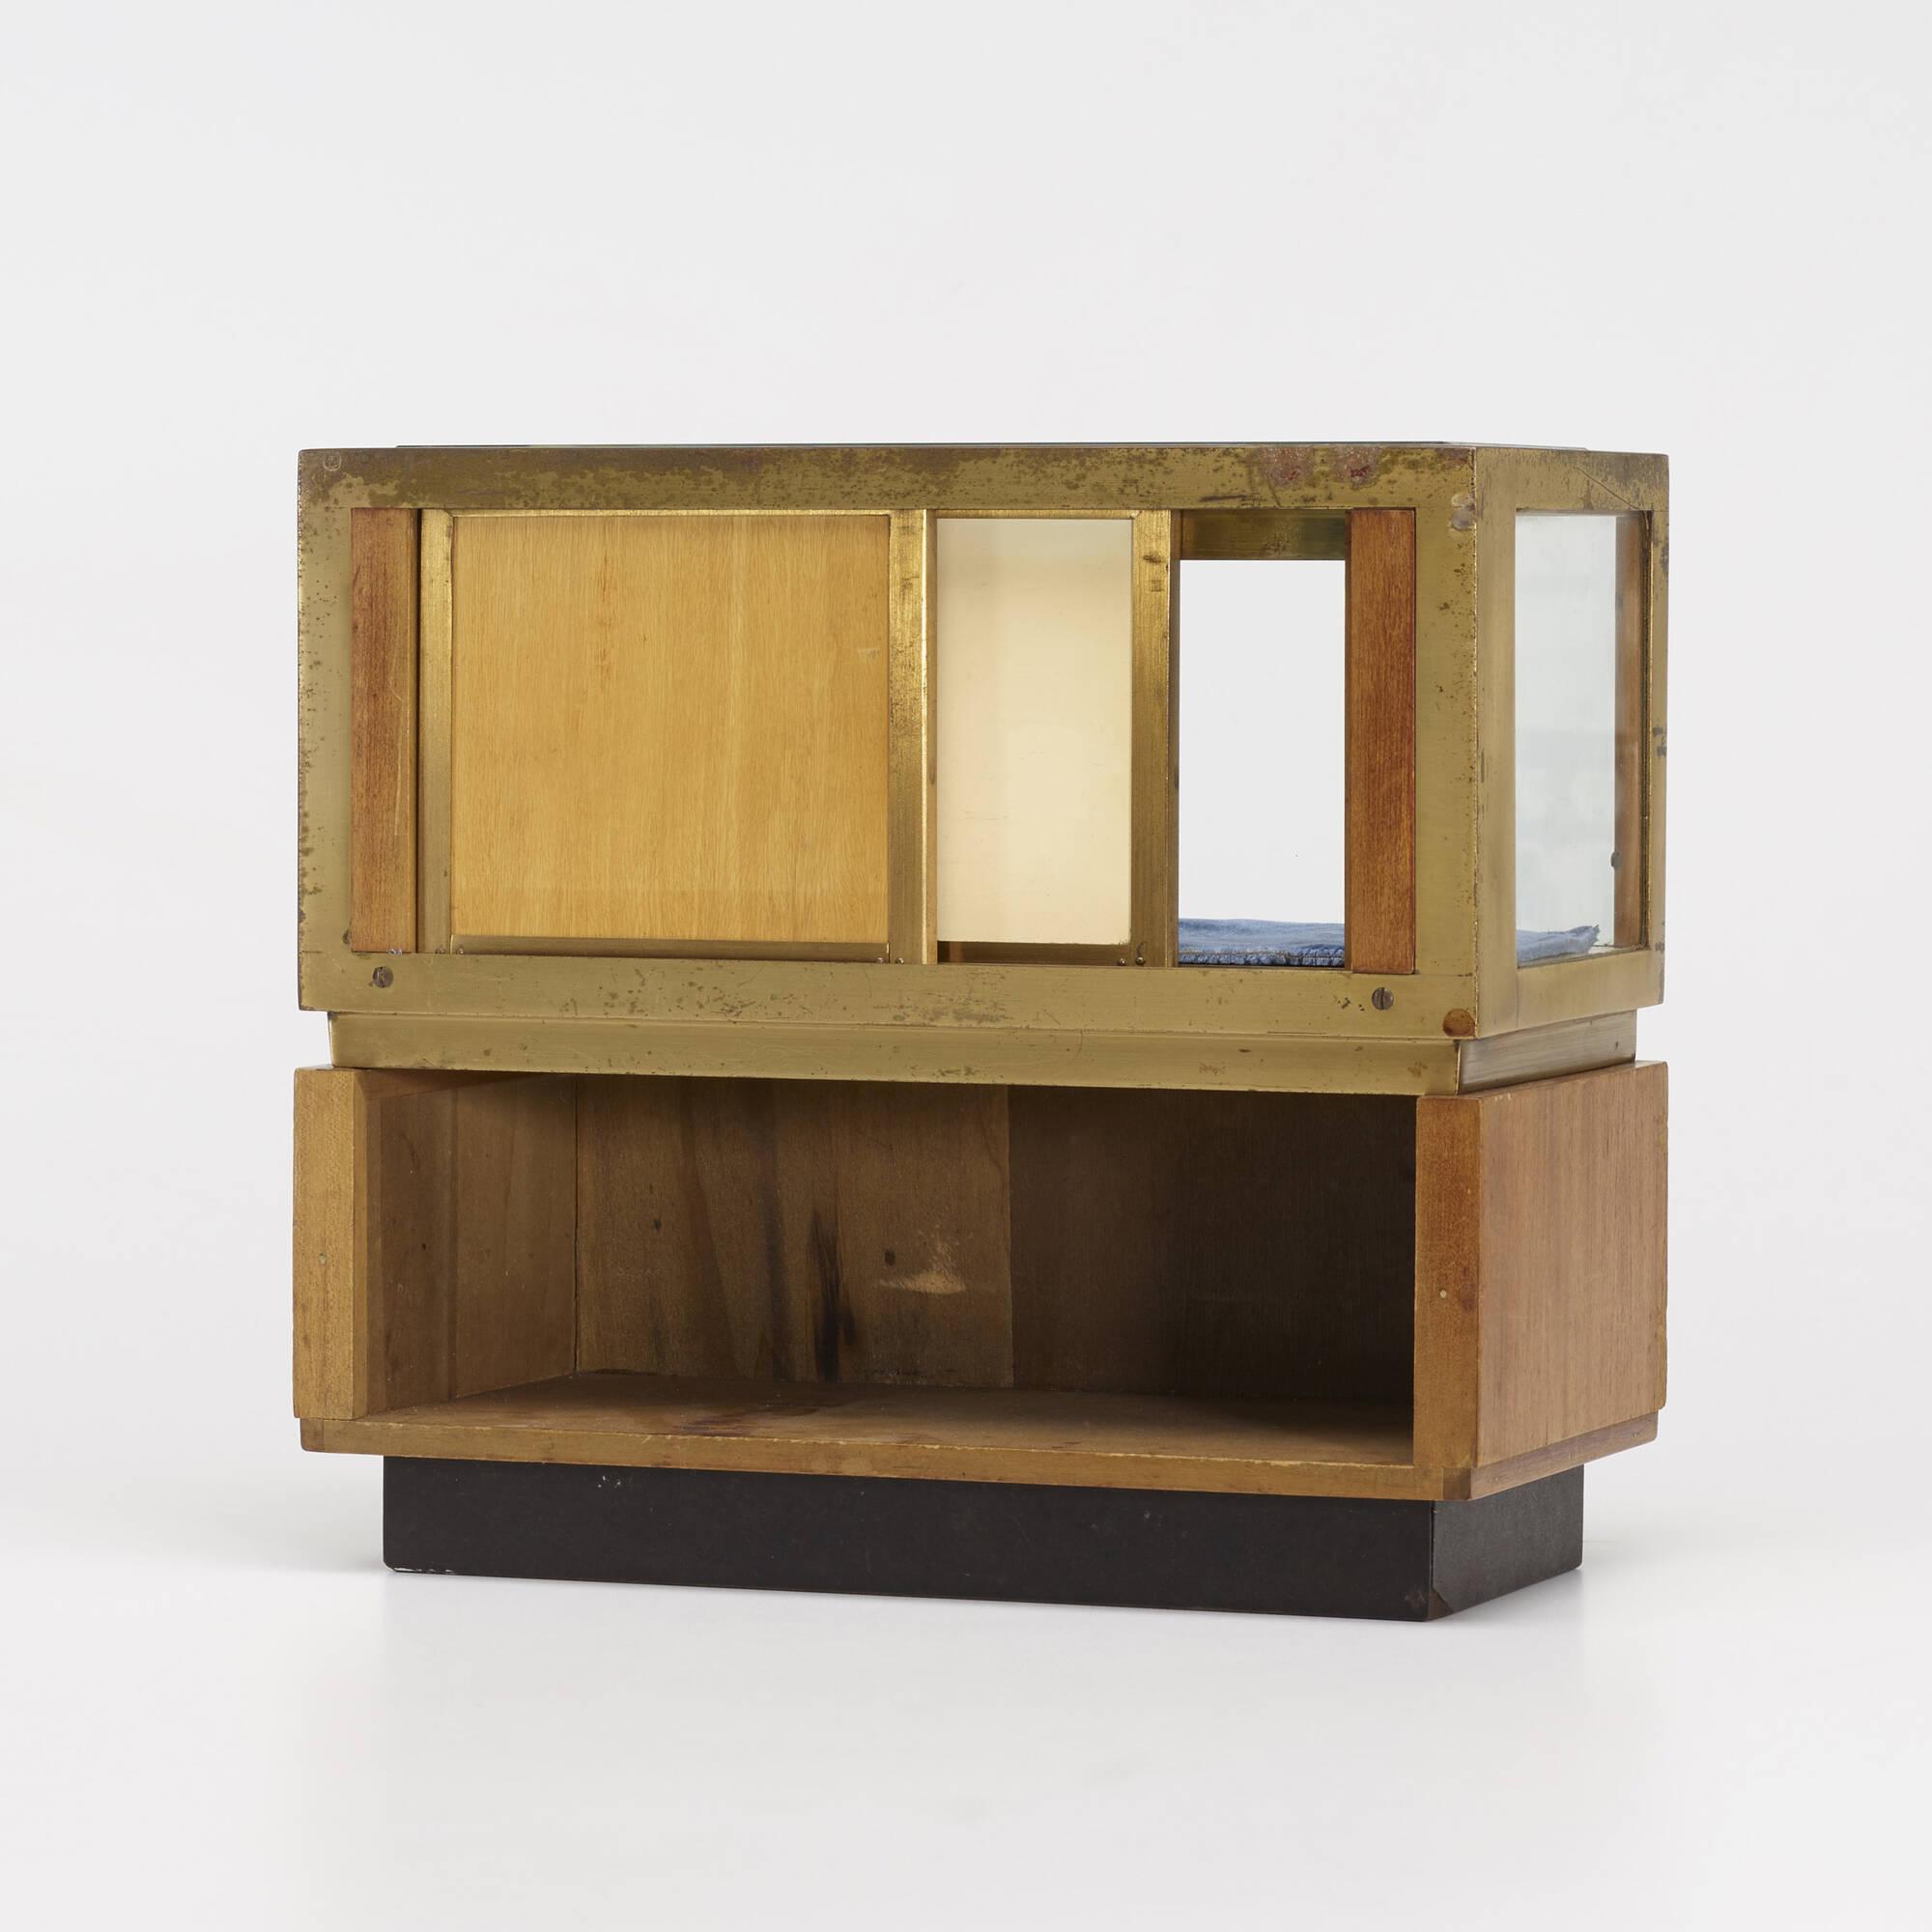 248: American / salesman's sample vitrine (2 of 2)